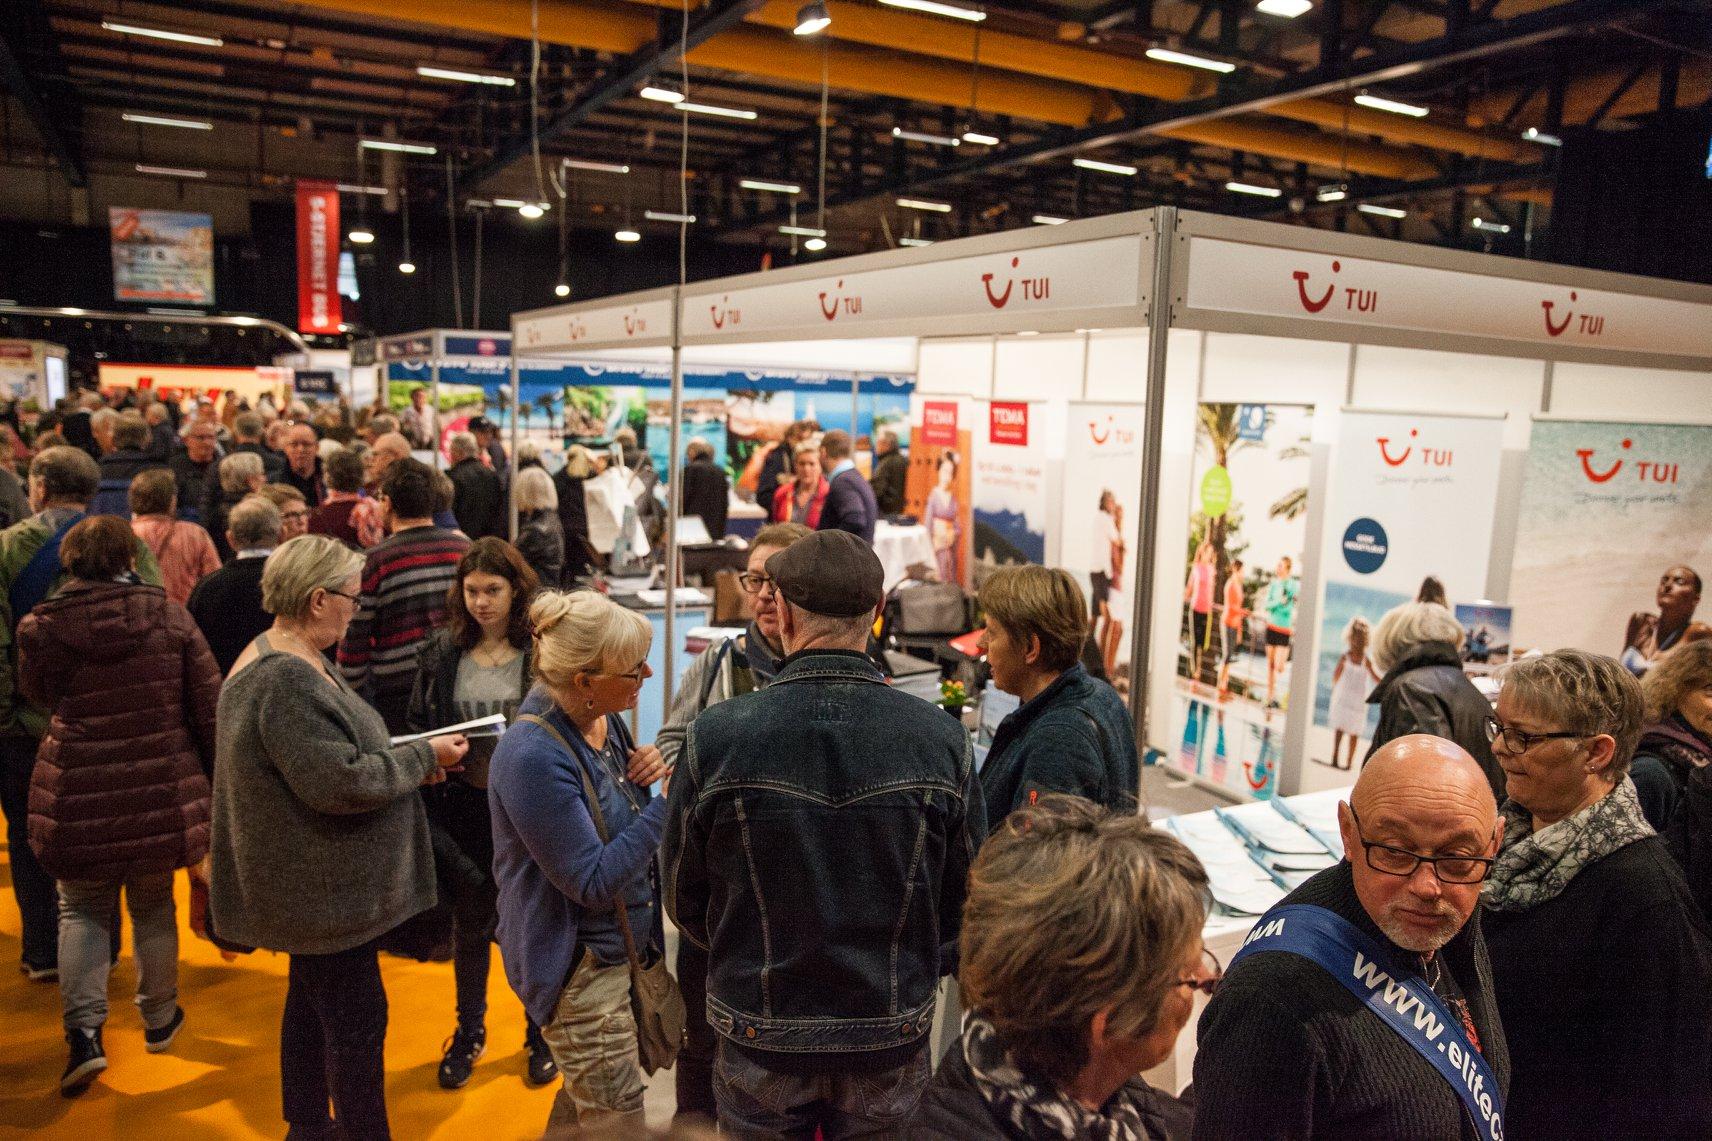 Til januar er der atter Ferie-Fritid messe i Odense Congress Center. Foto: OCC, Hans Kristian Hannibal-Bach.